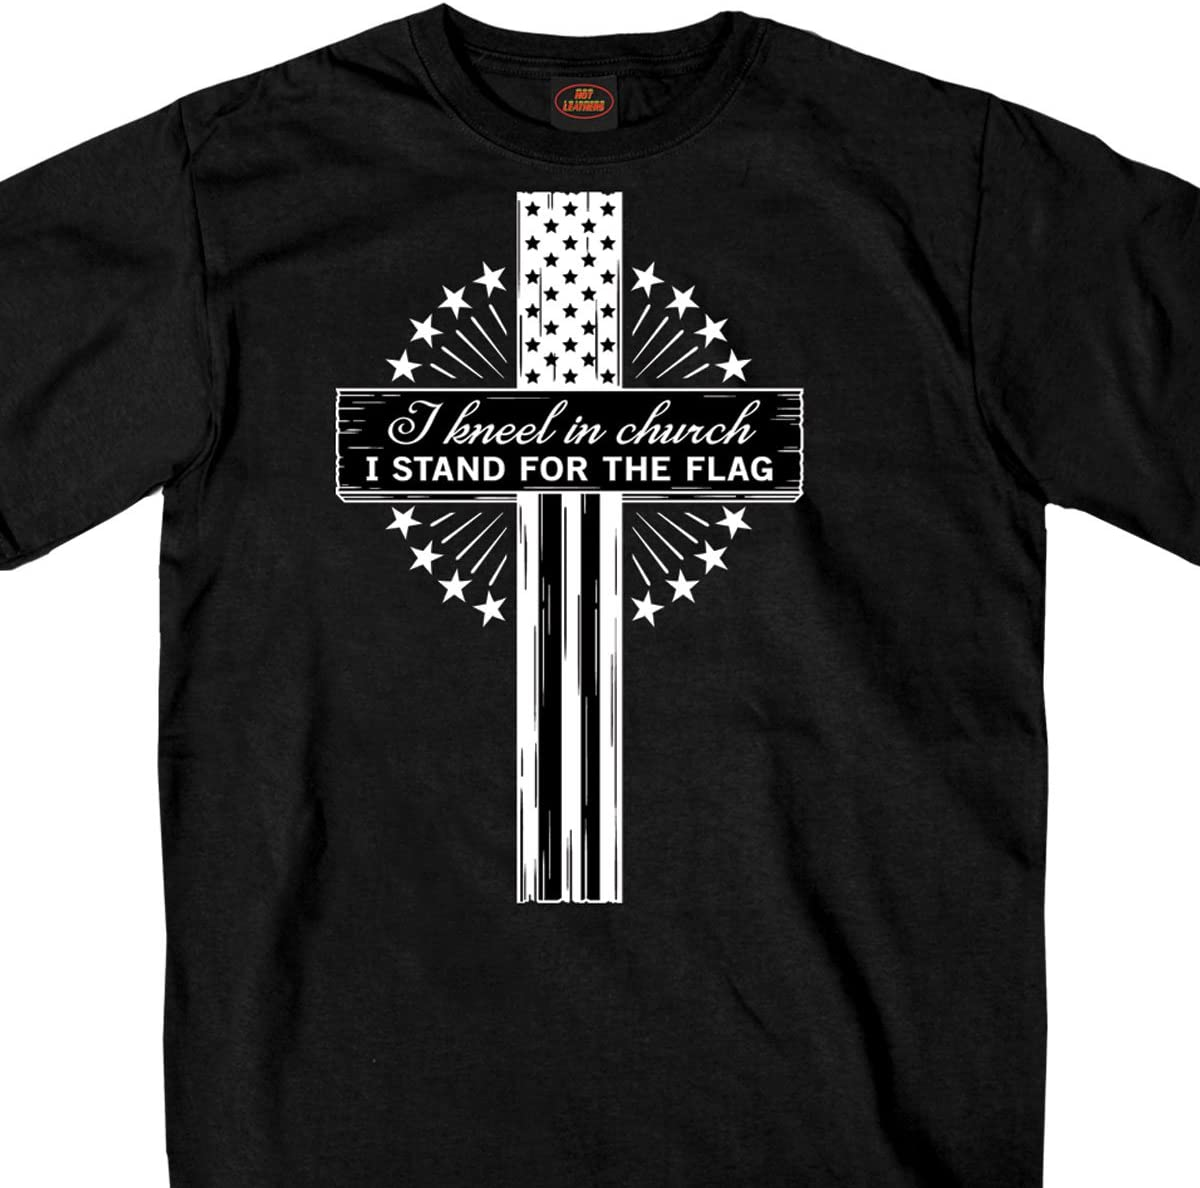 Black, Medium Hot Leathers Mens Short Sleeve Kneel in The Church t-Shirt